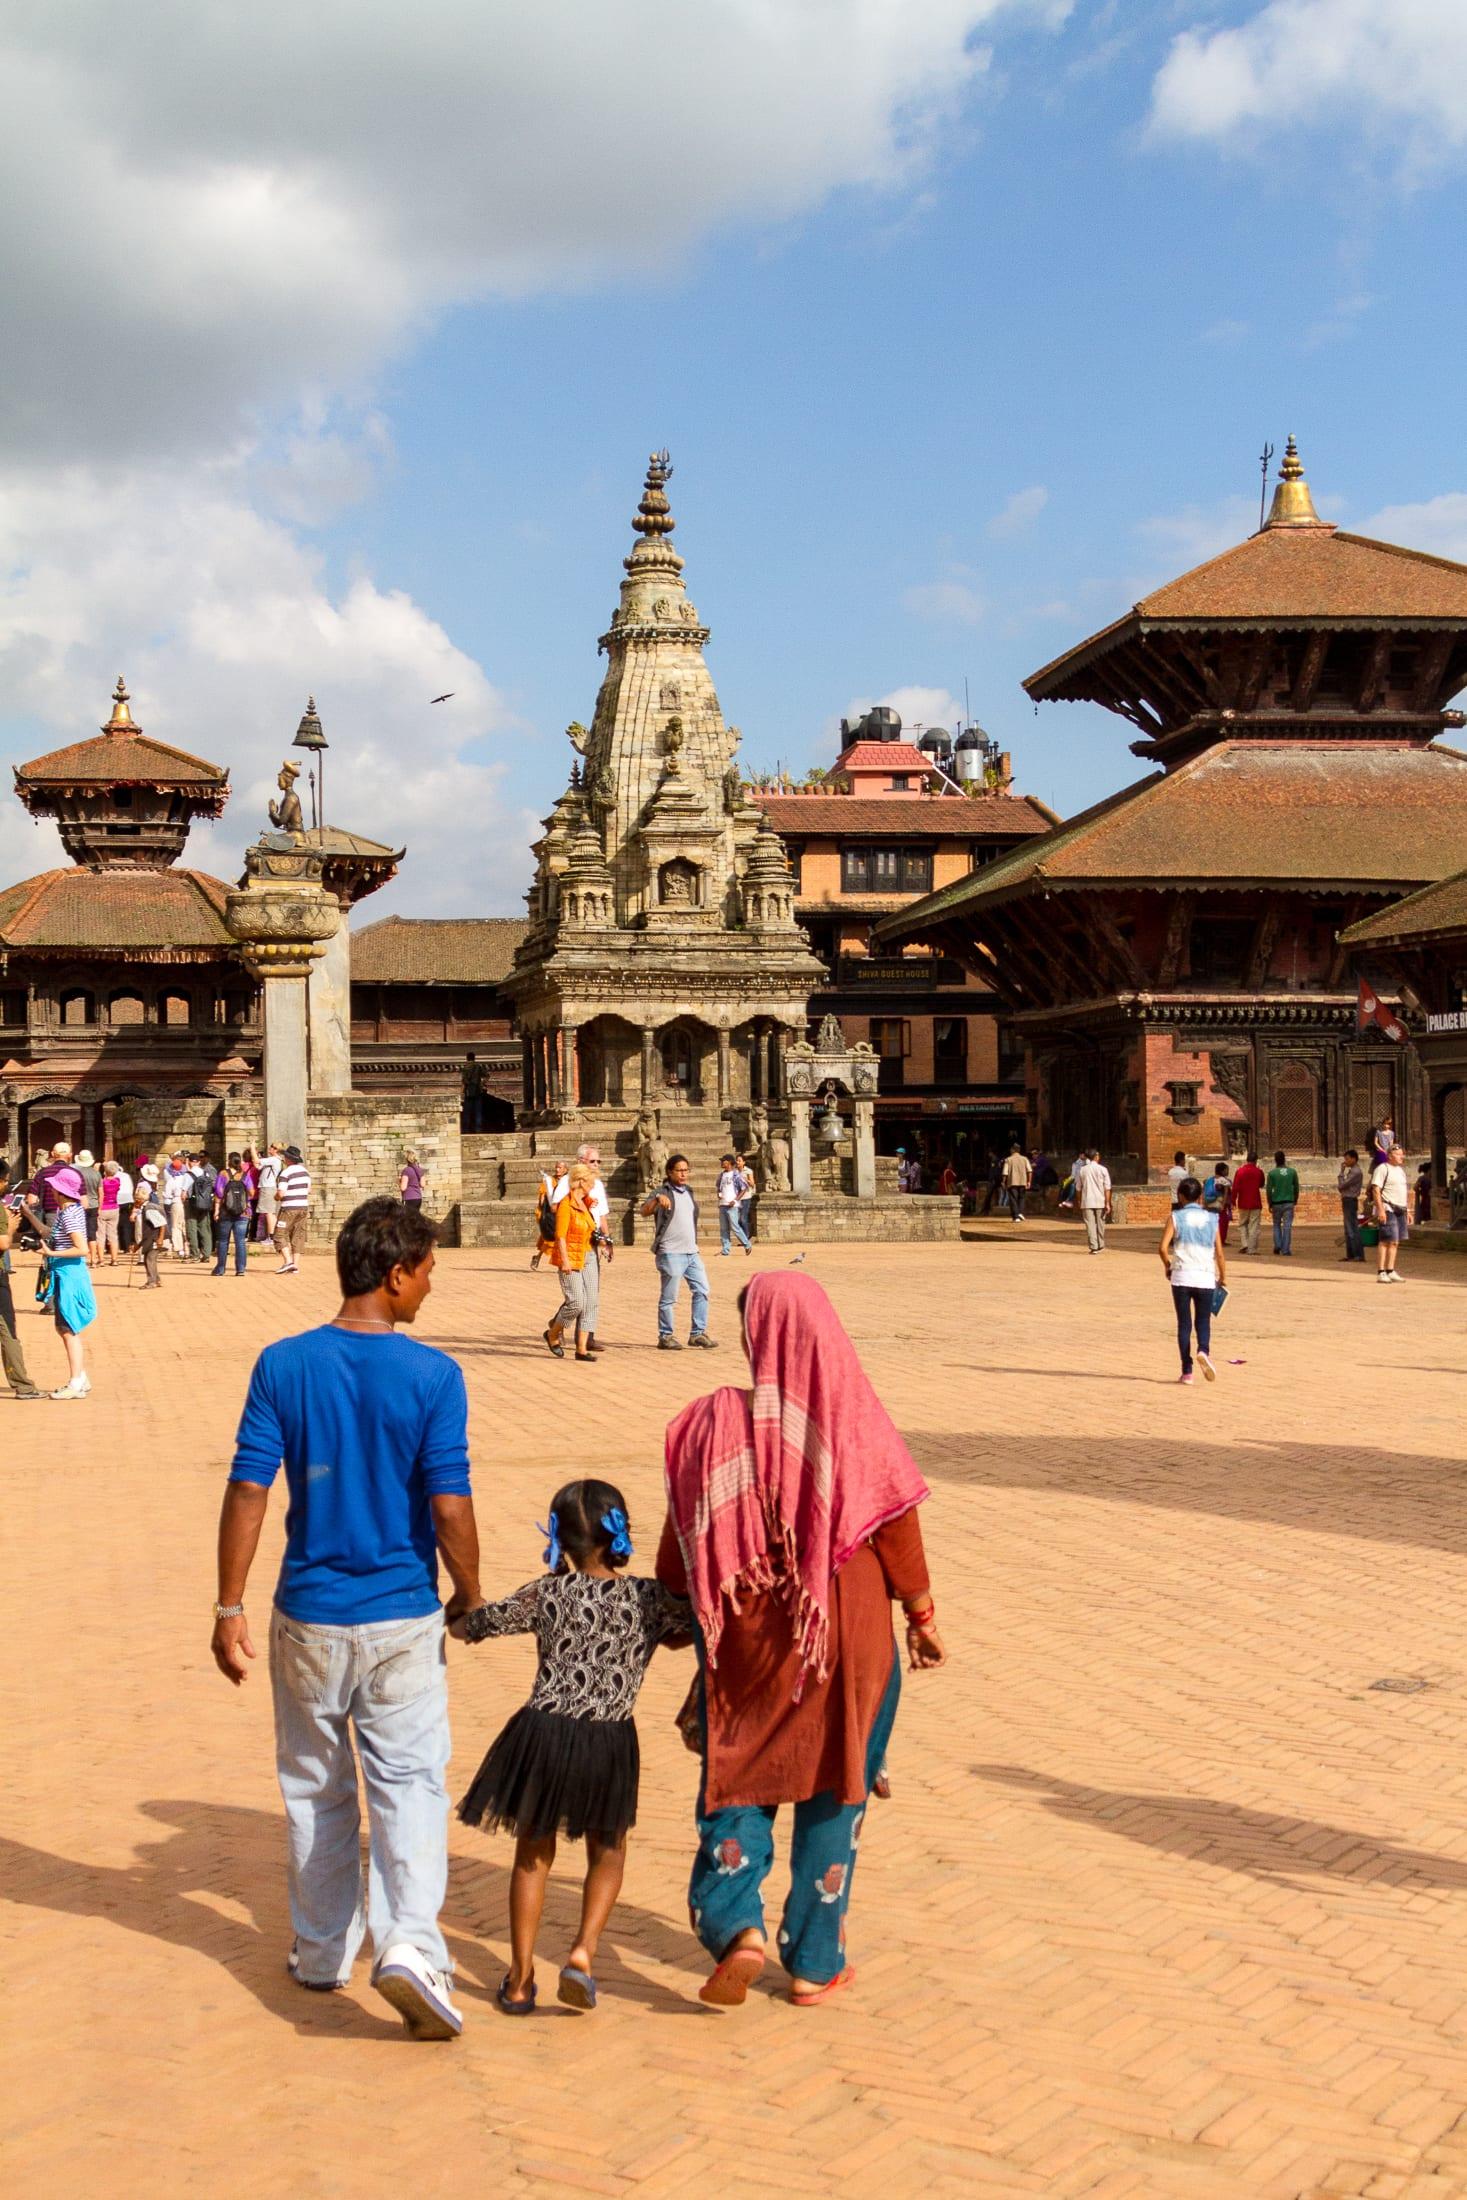 Peter-West-Carey-Nepal2013-0930-2776